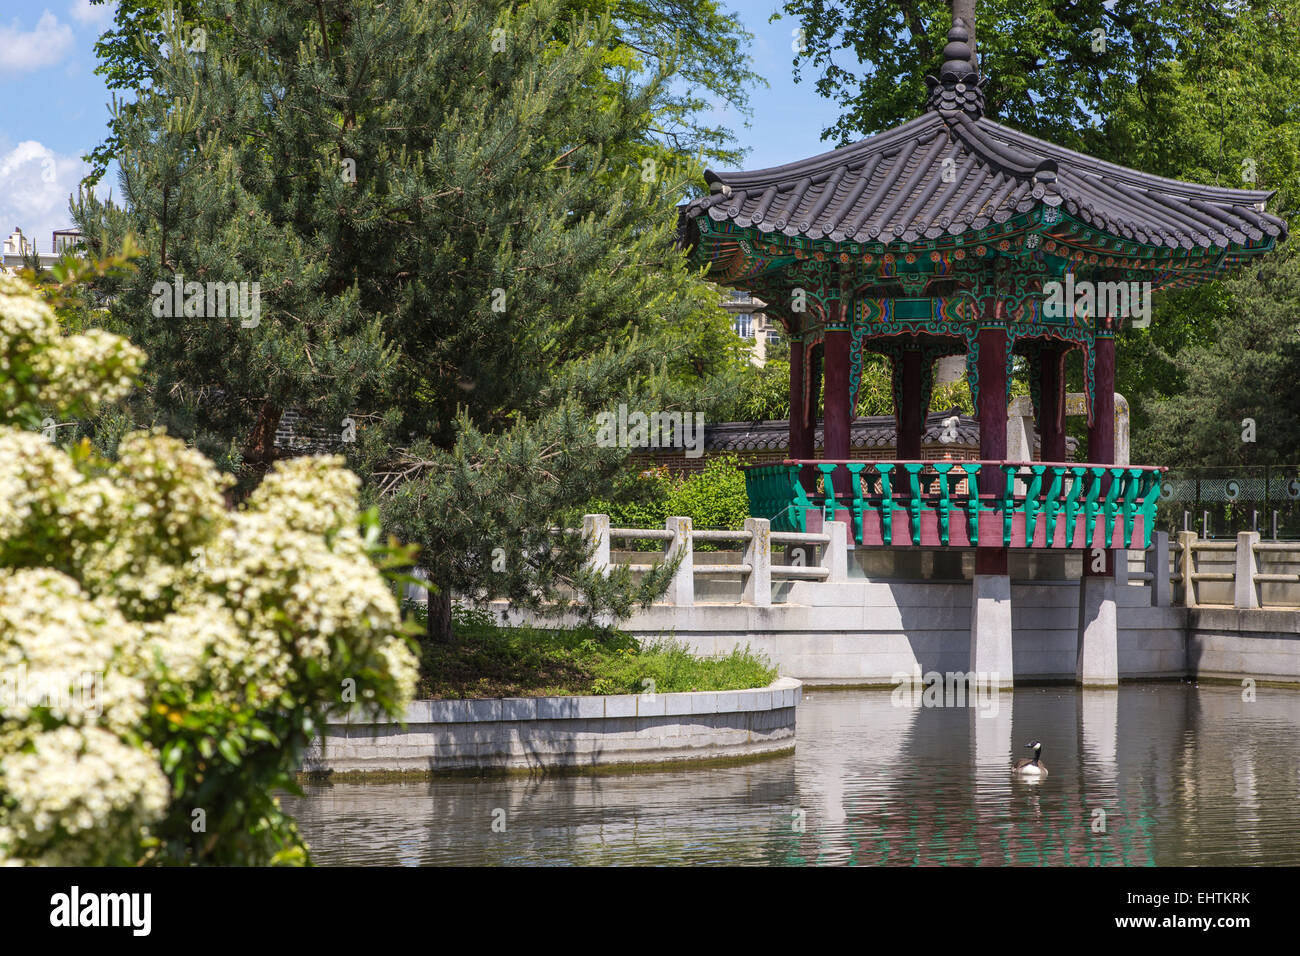 Pagoda paris stock photos pagoda paris stock images alamy - Jardin d acclimatation bois de boulogne ...